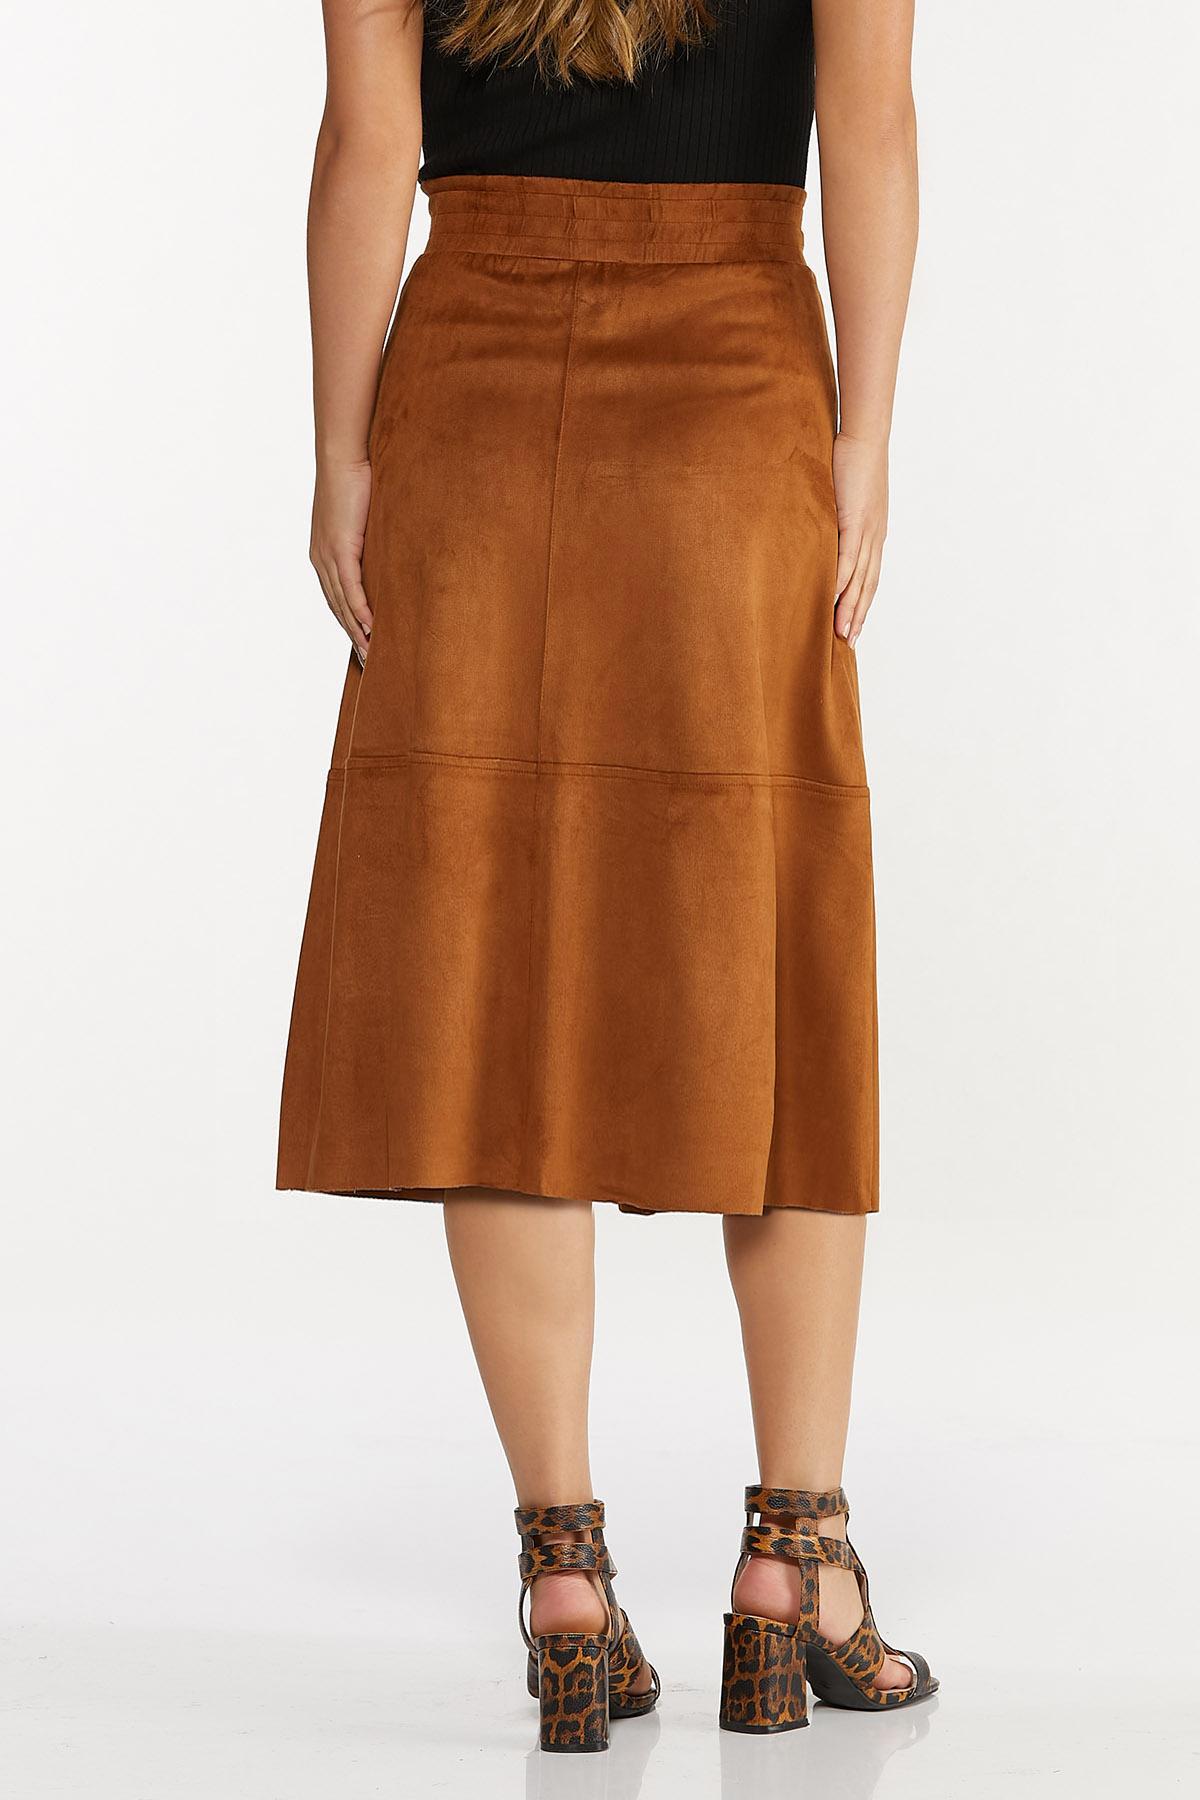 Plus Size Faux Suede Midi Skirt (Item #44652731)